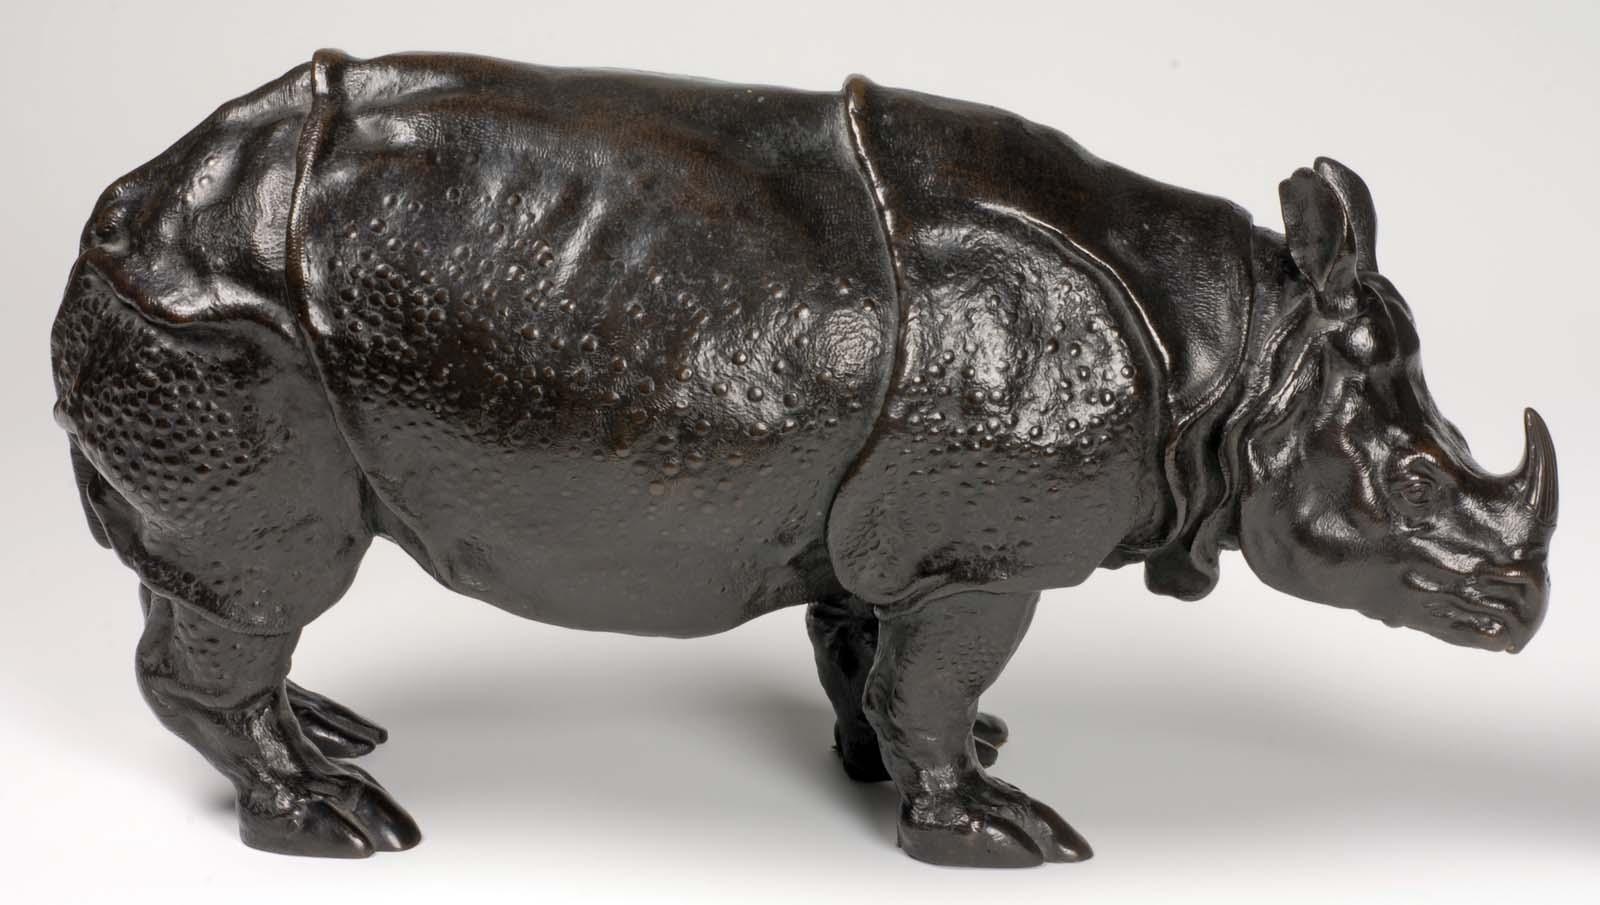 a bronze cast model of a rhinoceros